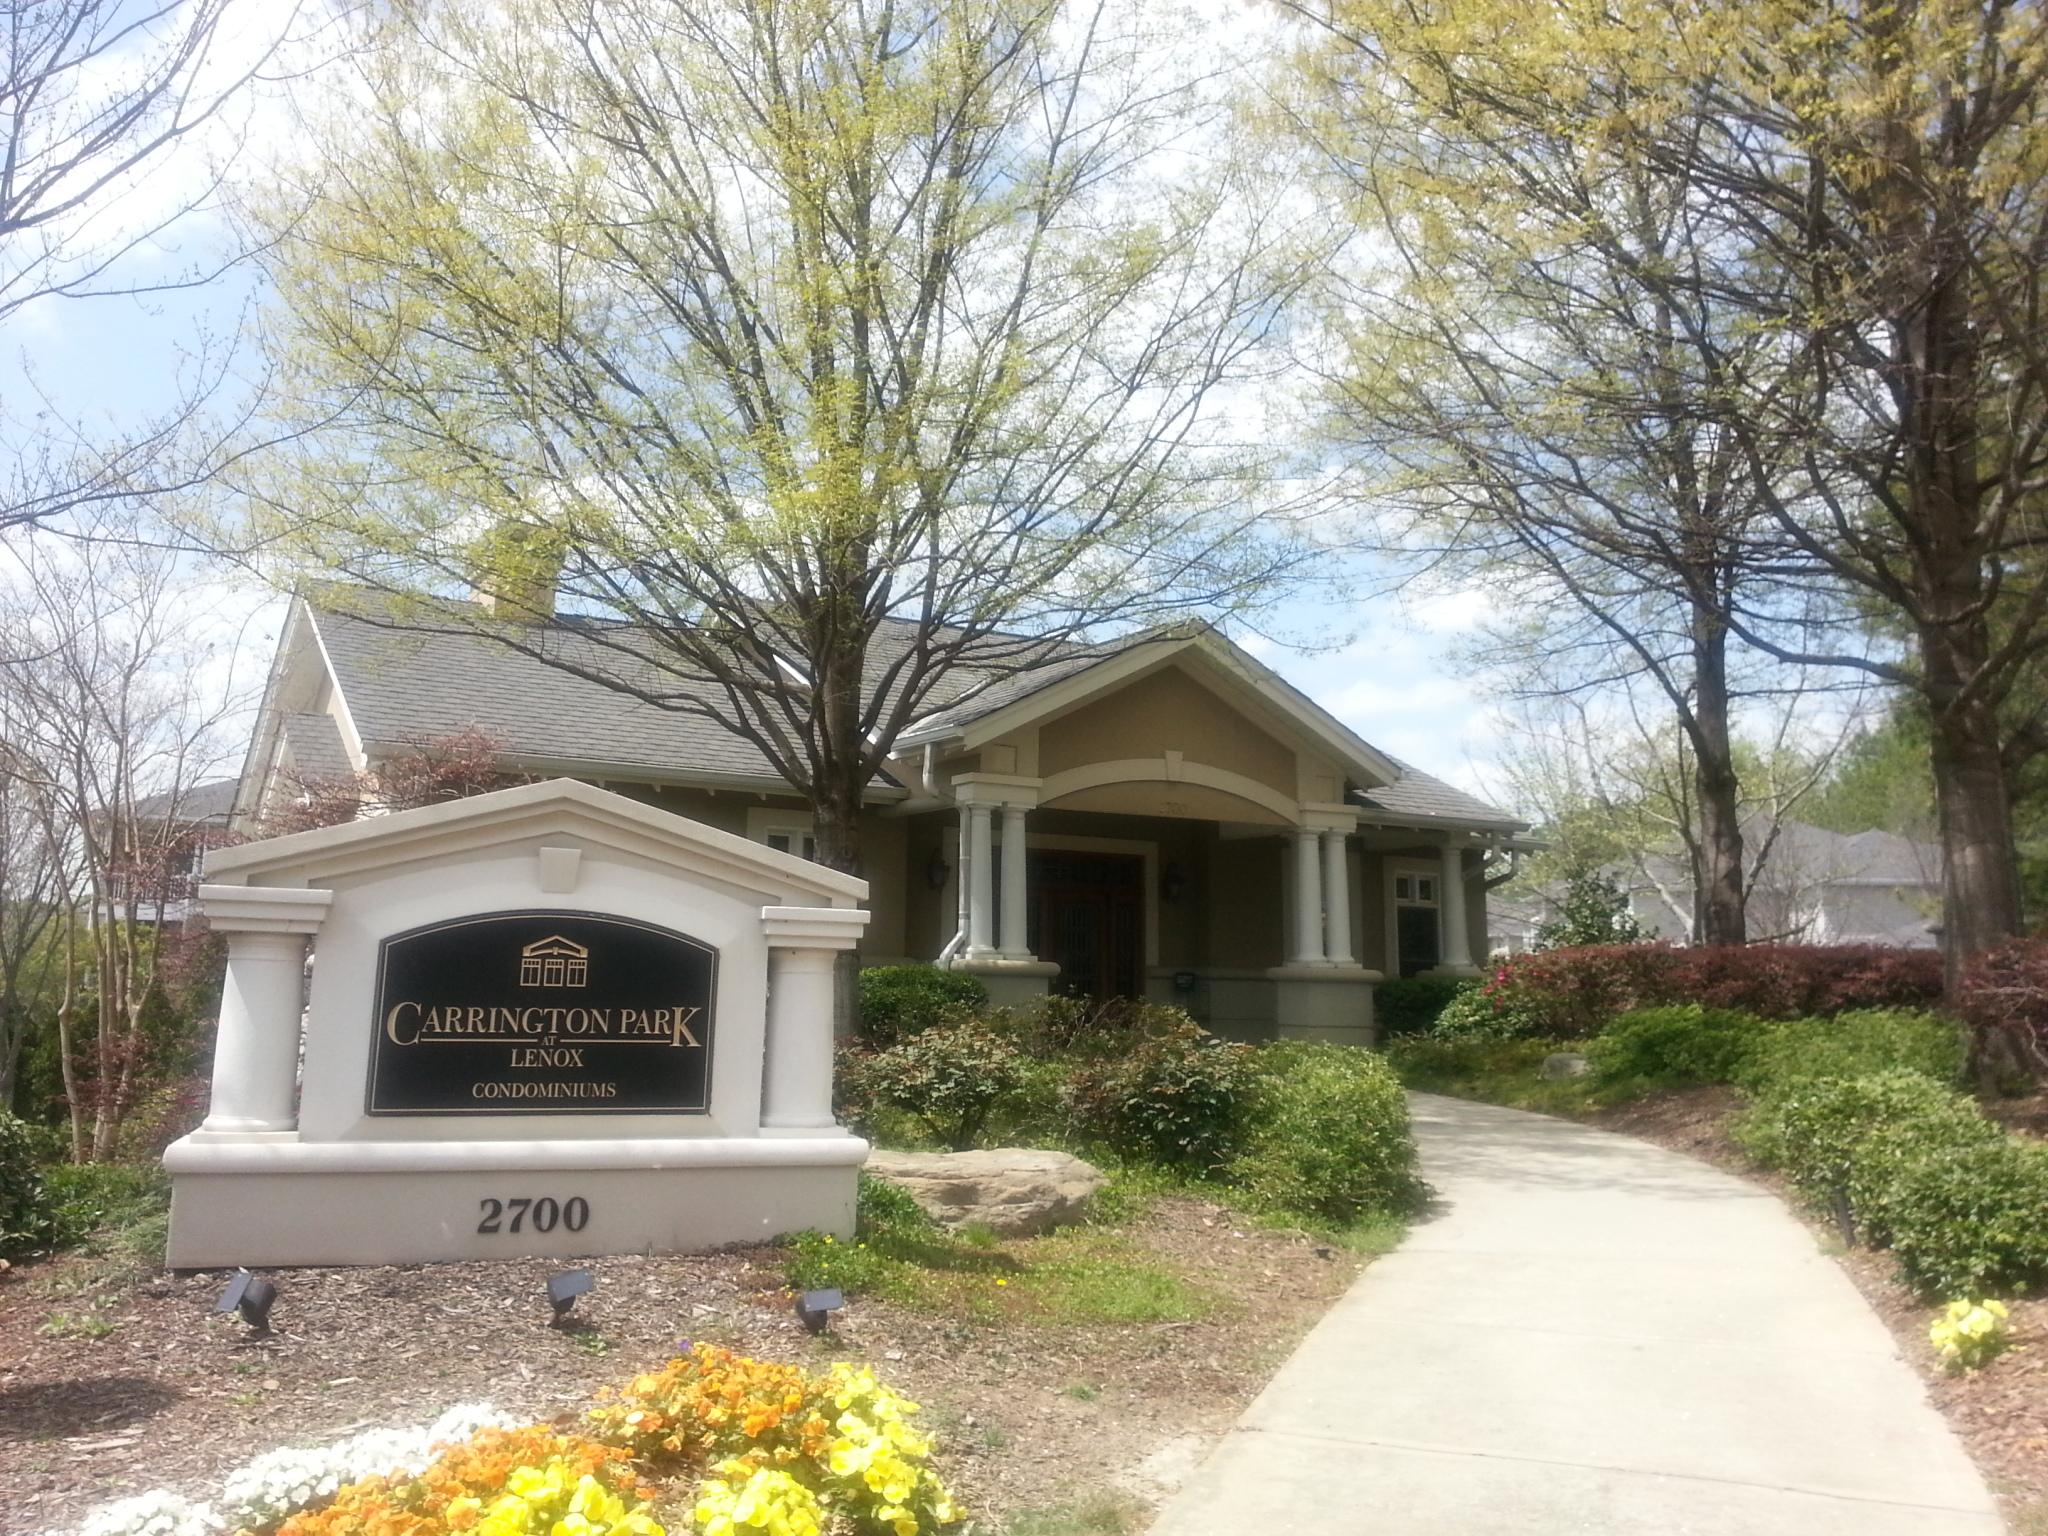 2700 Pine Tree Rd NE #1219 Atlanta GA 30324 – SOLD – $150,000